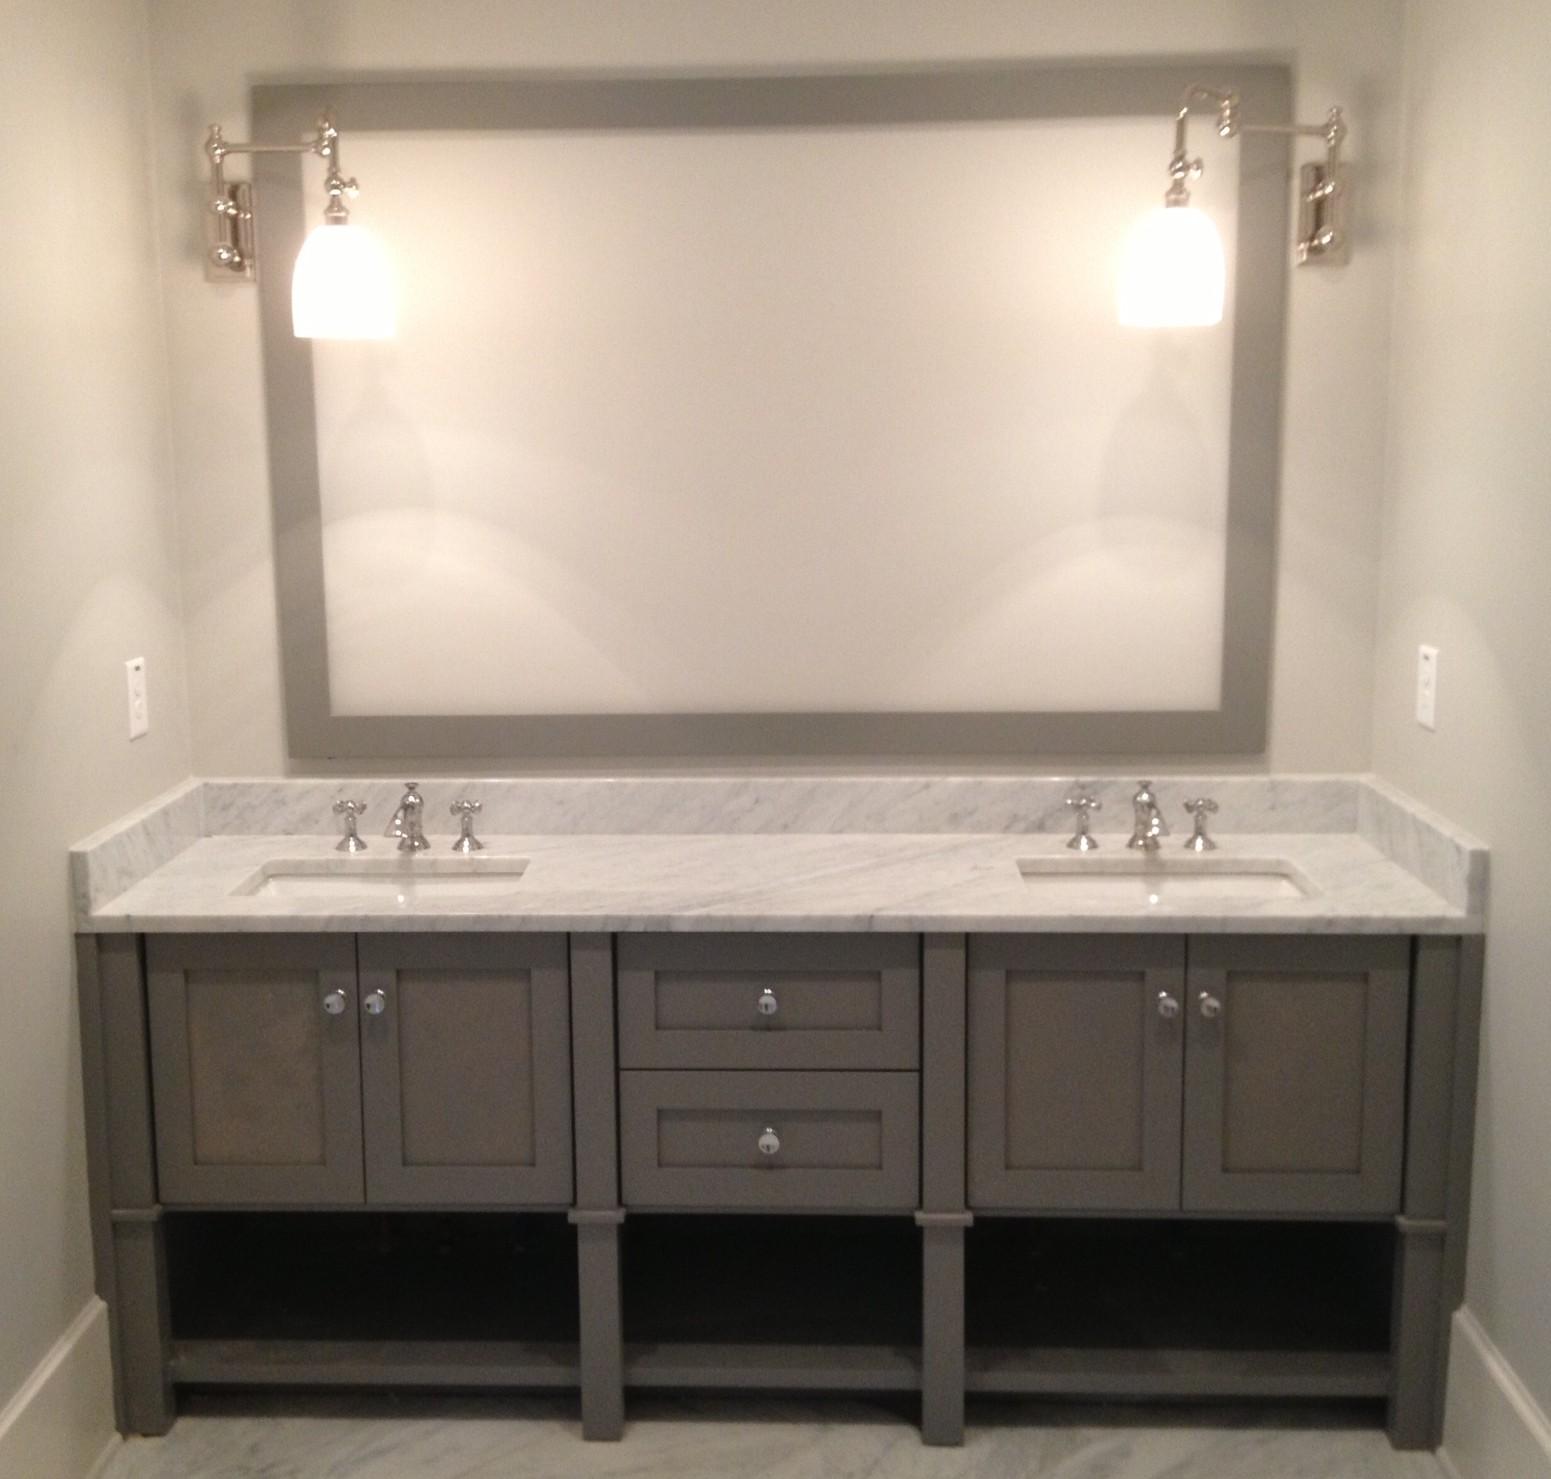 Custom Cabinets, Furniture & Finishing in Marietta GA